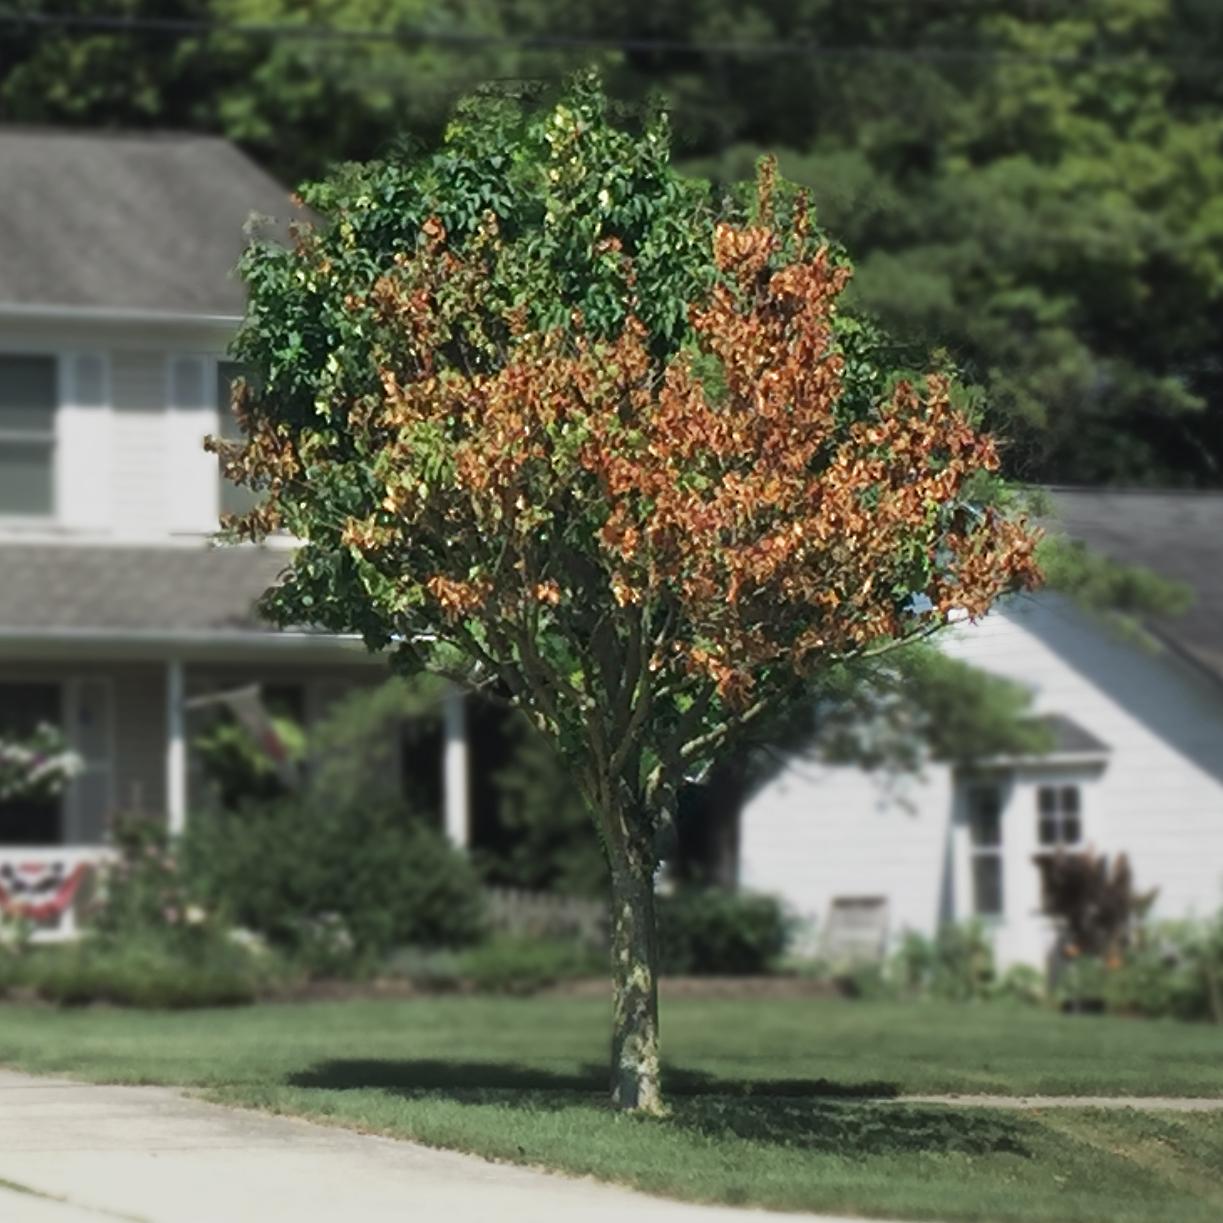 Verticillium Wilt* - Common Hosts: Maple, Smoke Tree, many othersLearn More